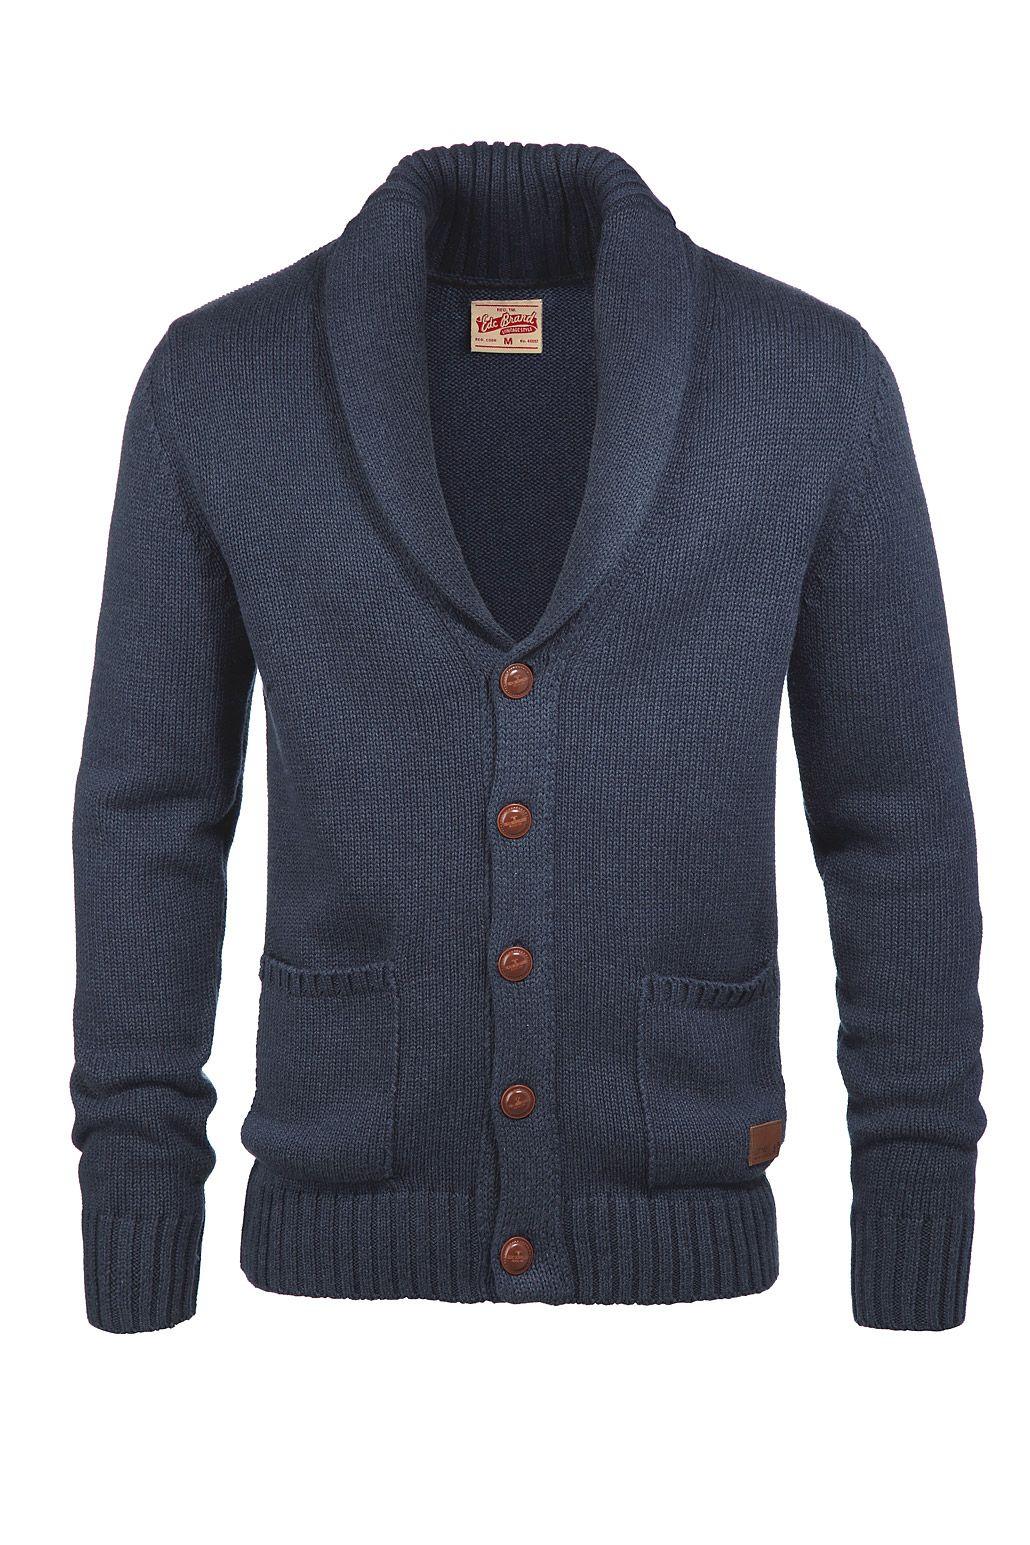 4317d189a426fc Schalragen Cardigan EDC - Esprit Online-Shop | Dressed Man ...